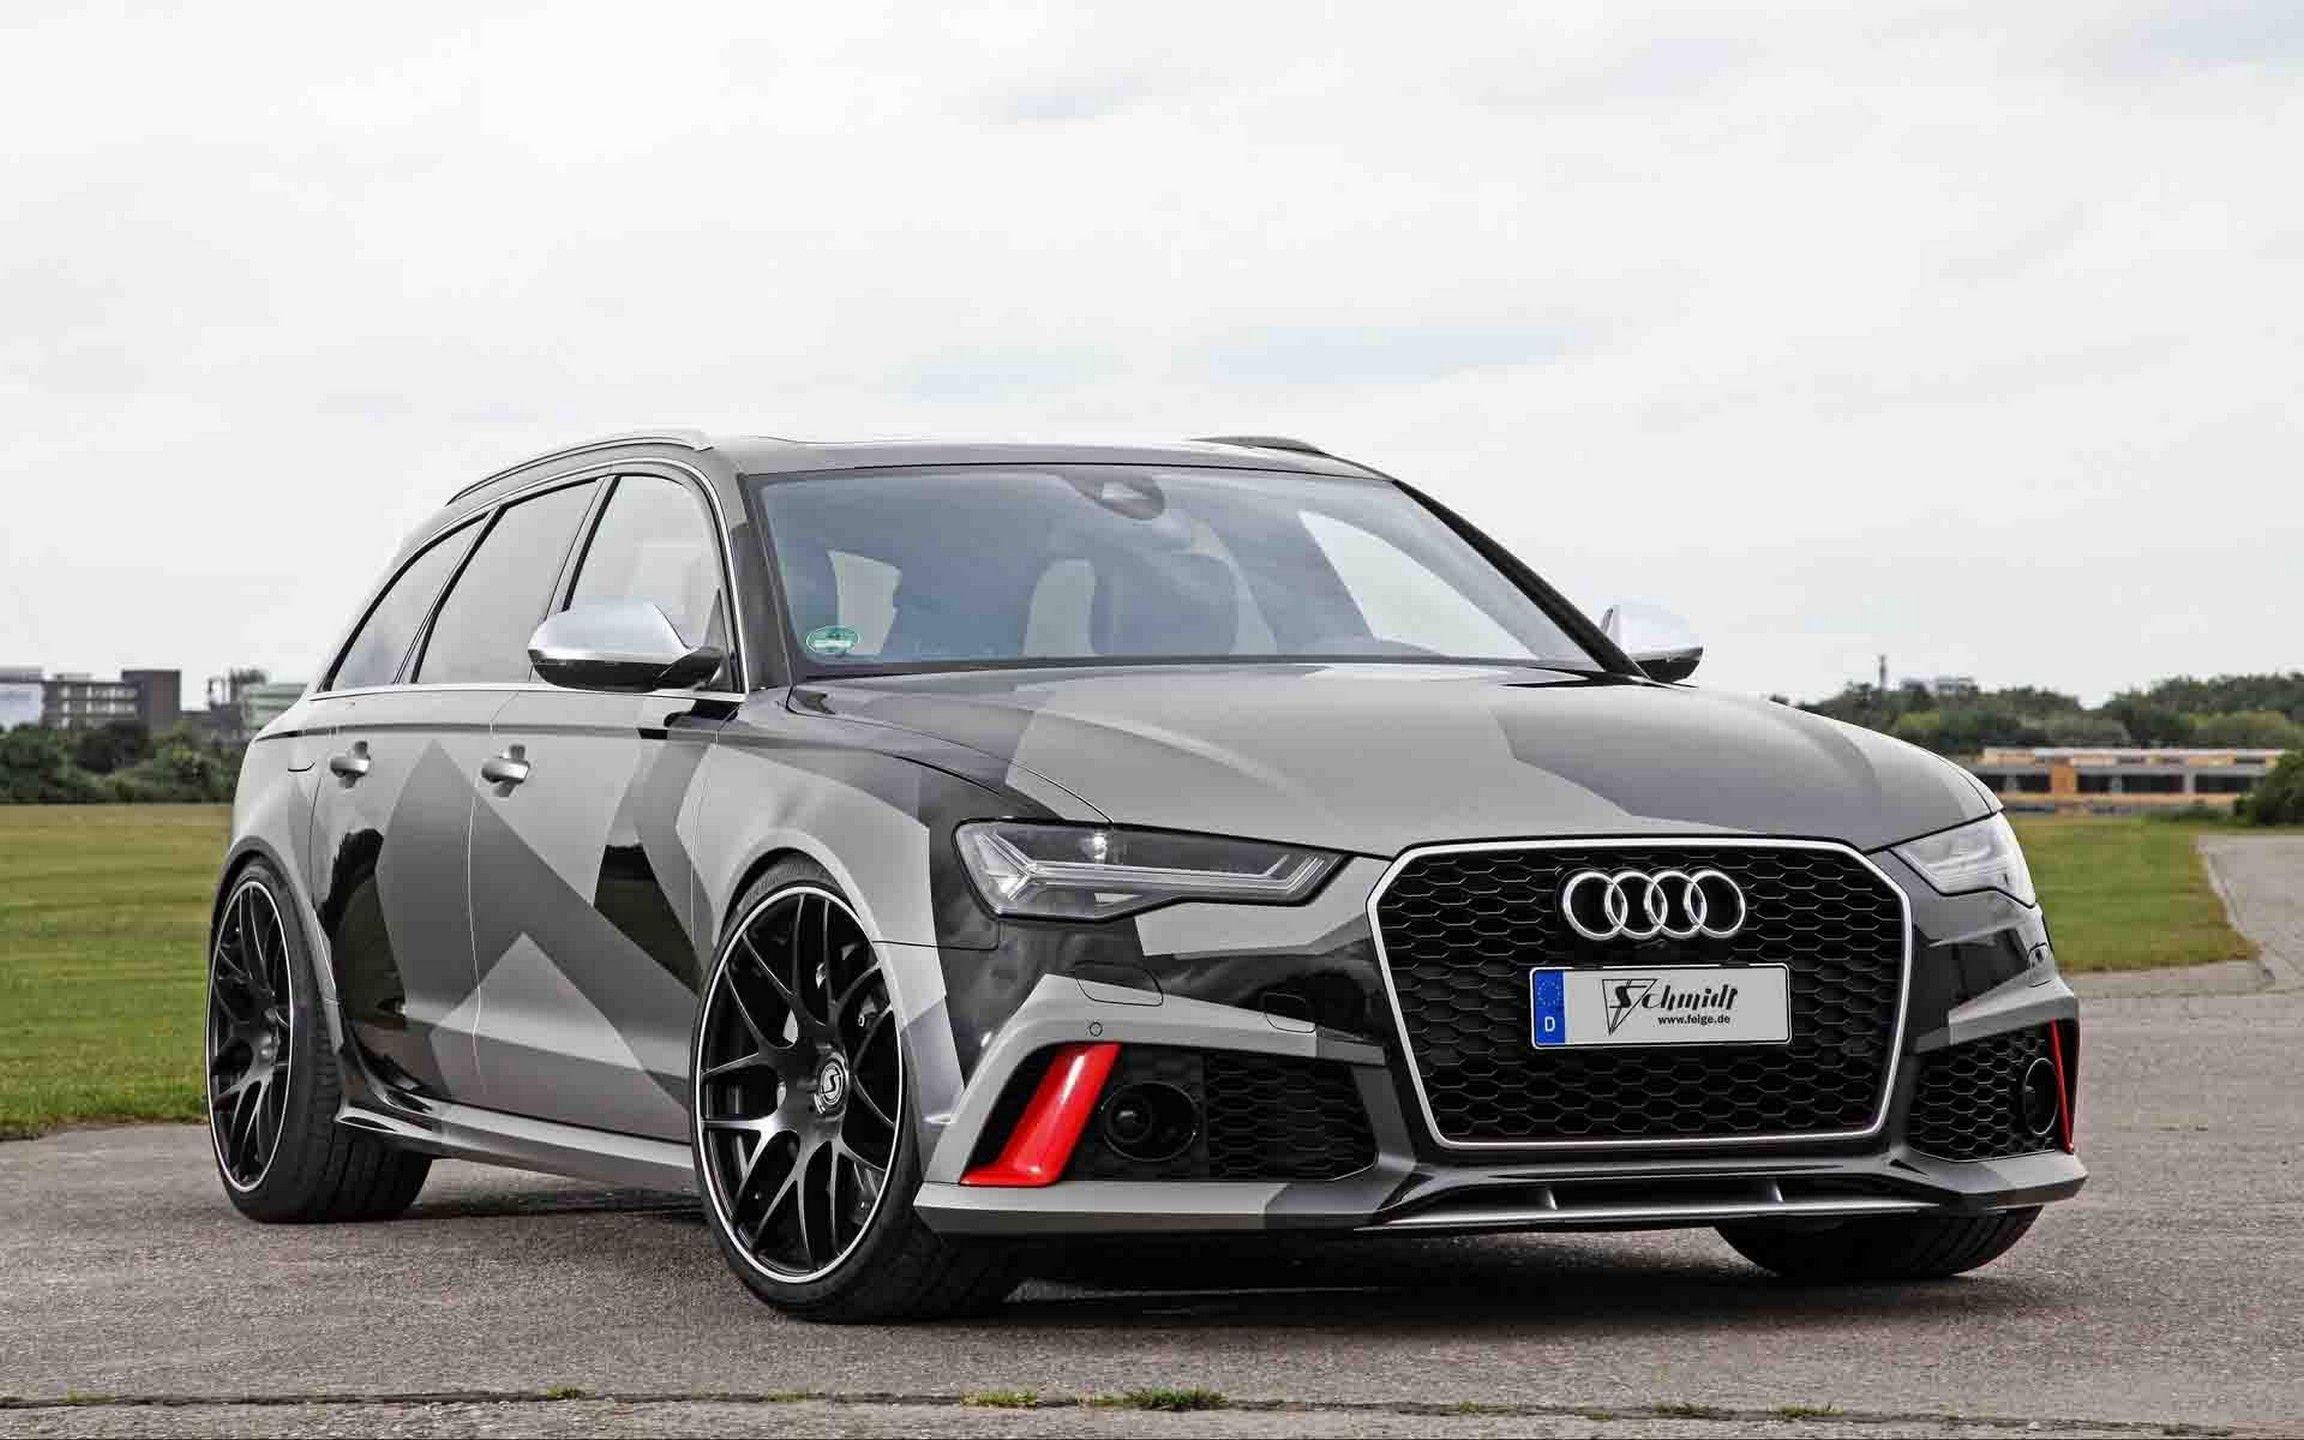 2021 Audi Rs 6 Owners Manual Audi Rs6 Audi Wagon Audi Rs